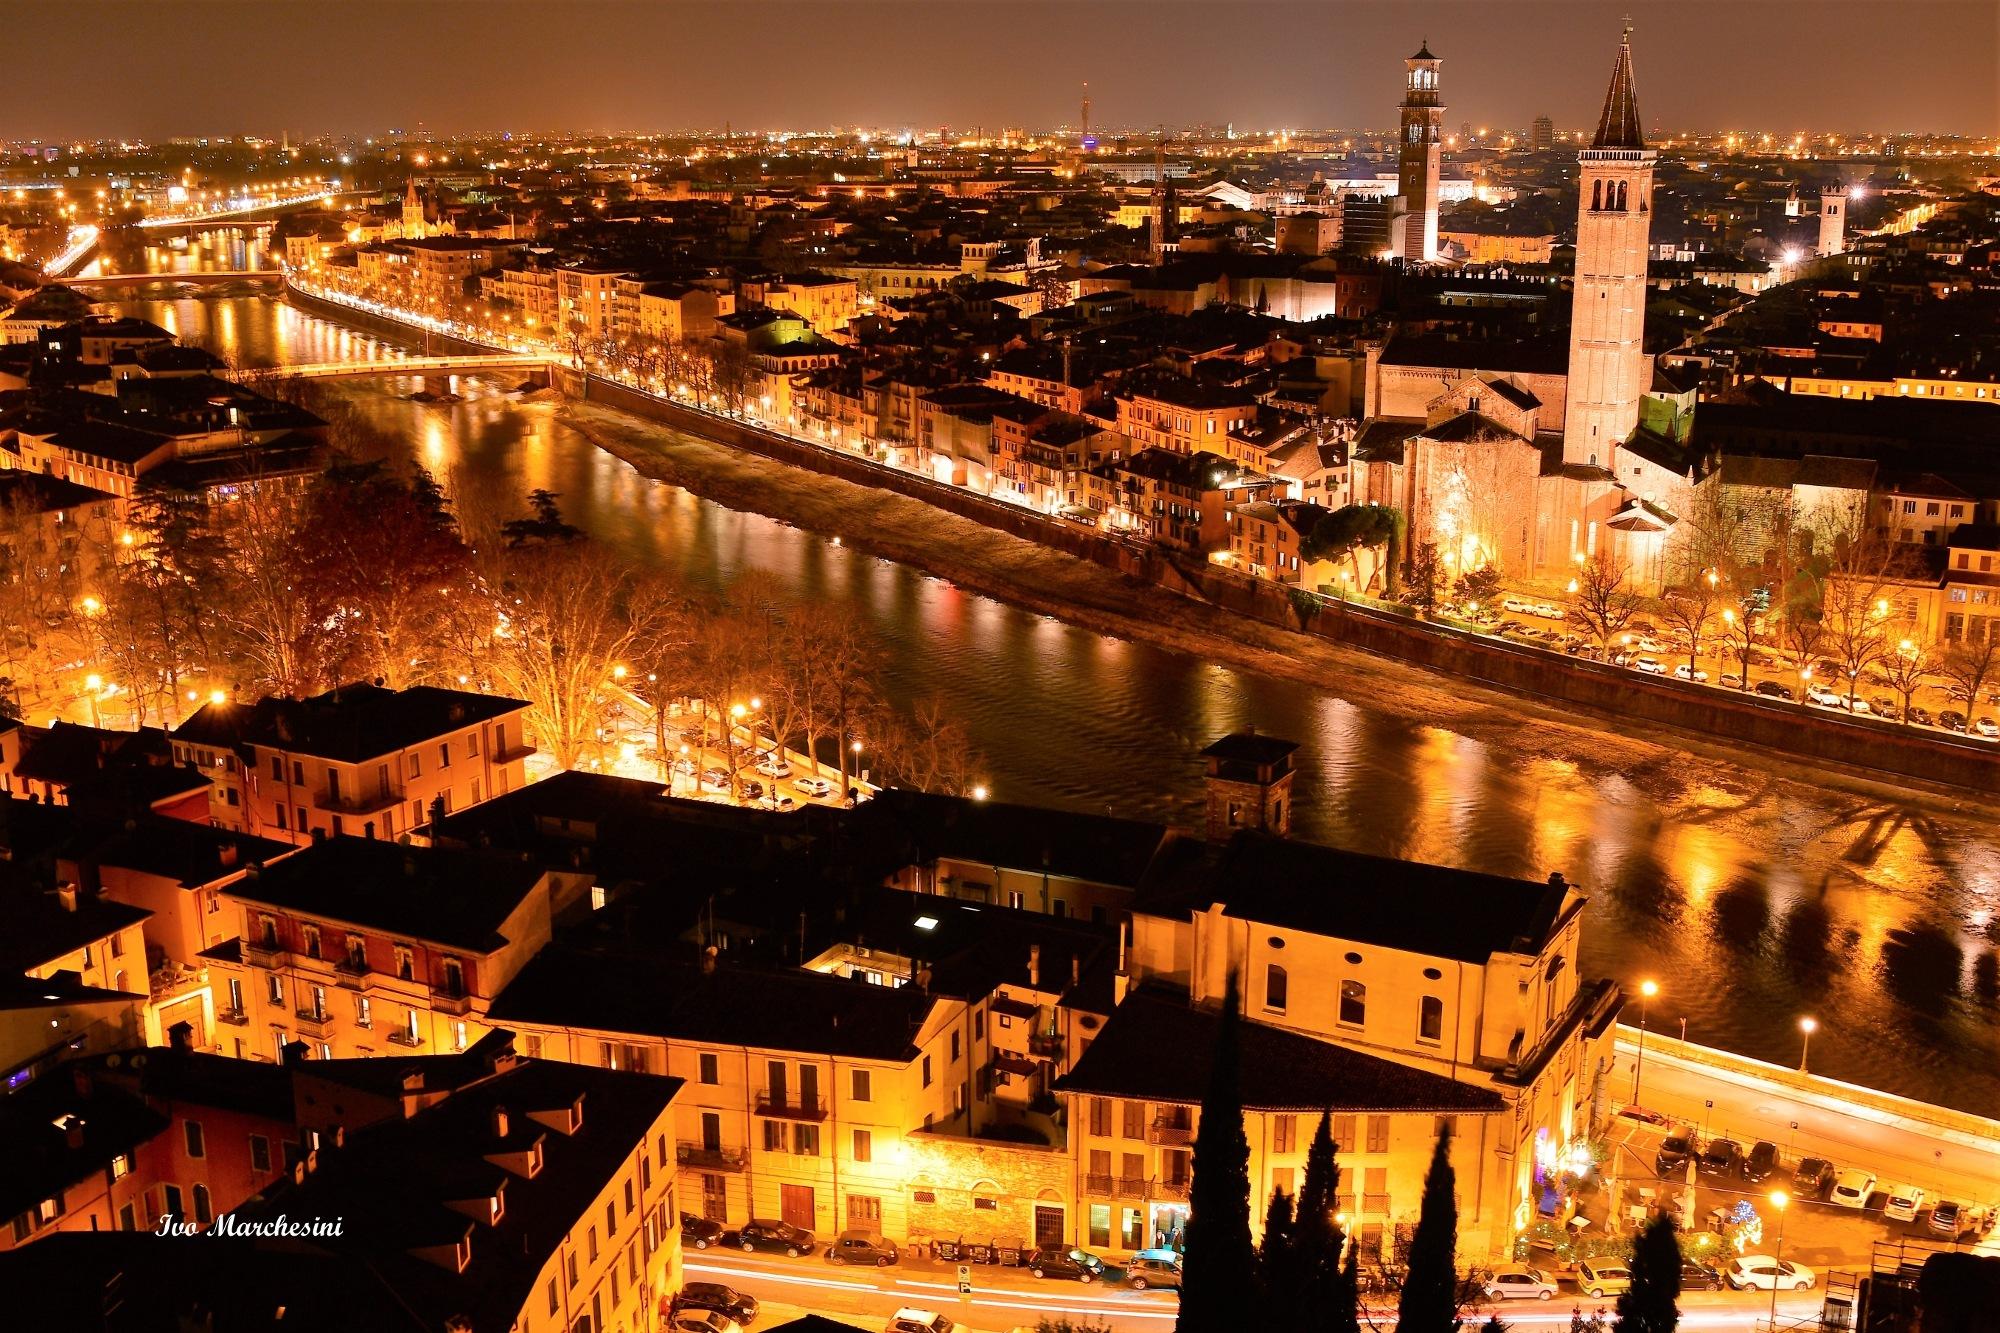 Verona night by Ivo Mar Marchesini